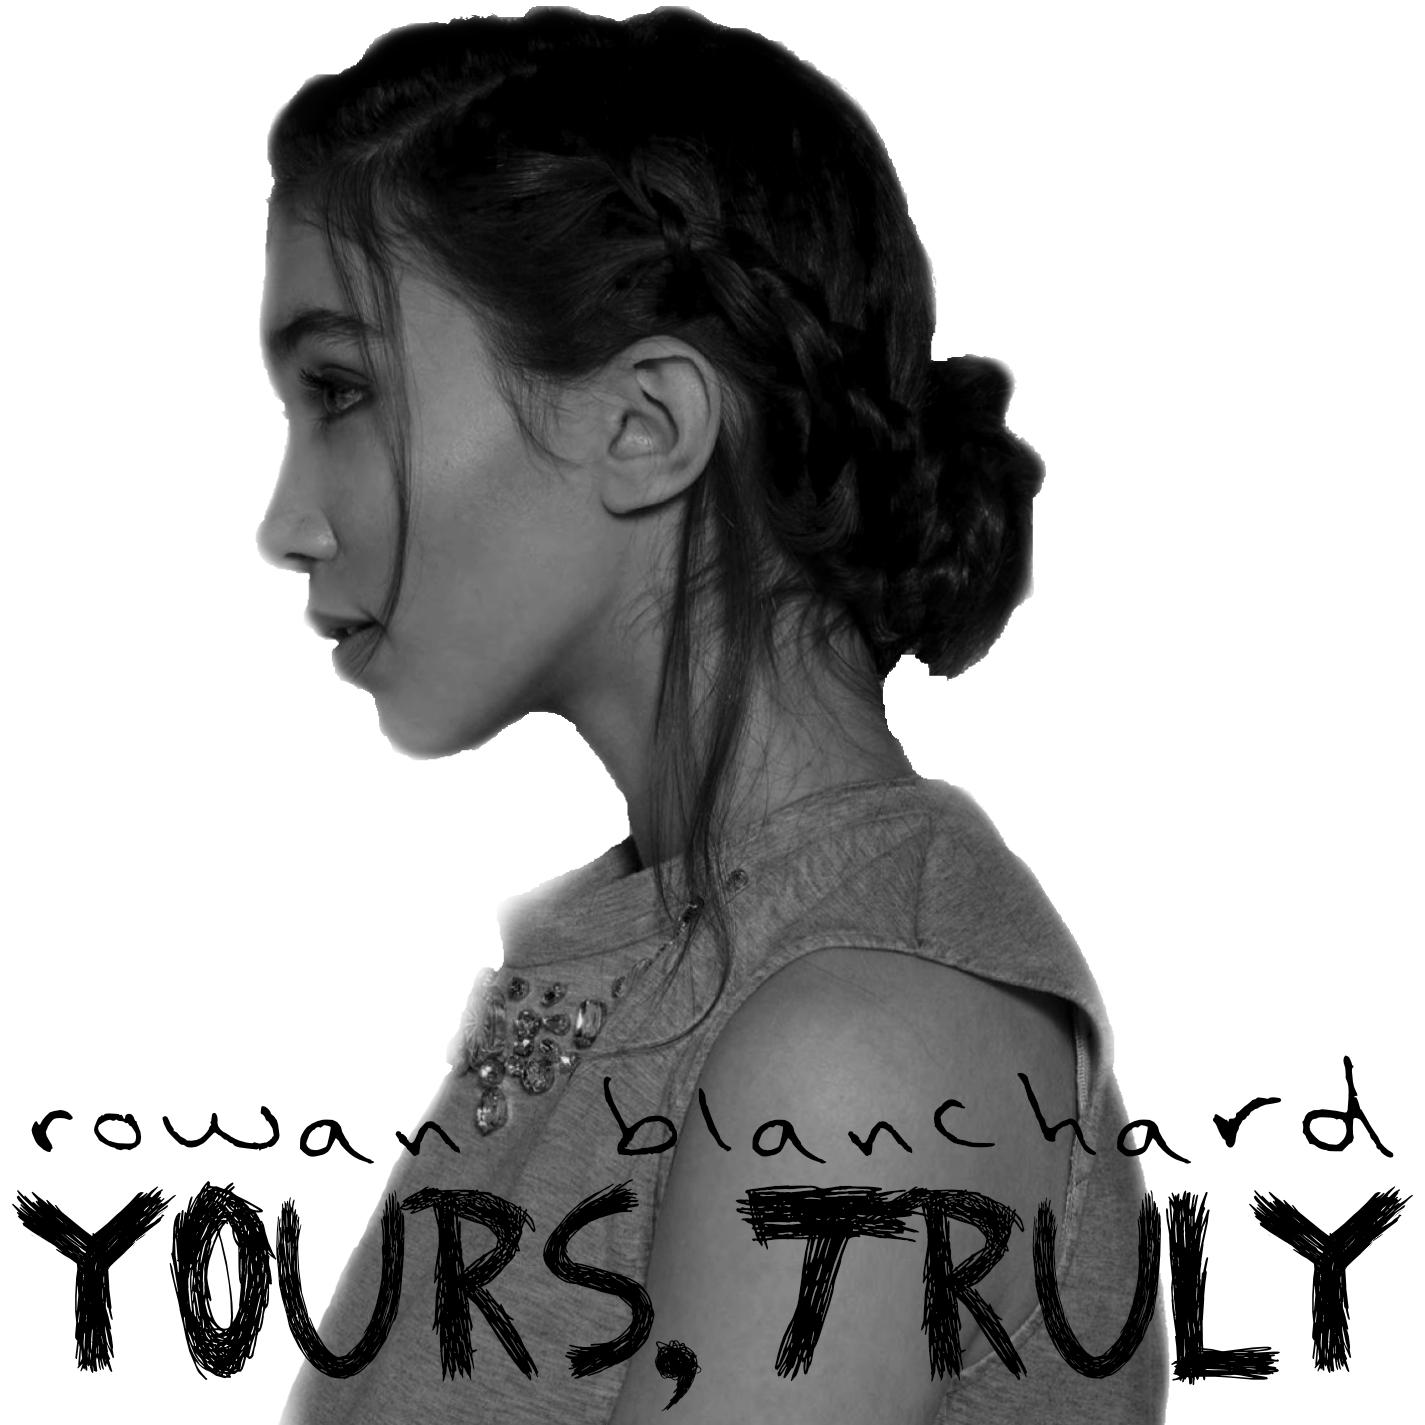 Yours, Truly (Rowan Blanchard album)